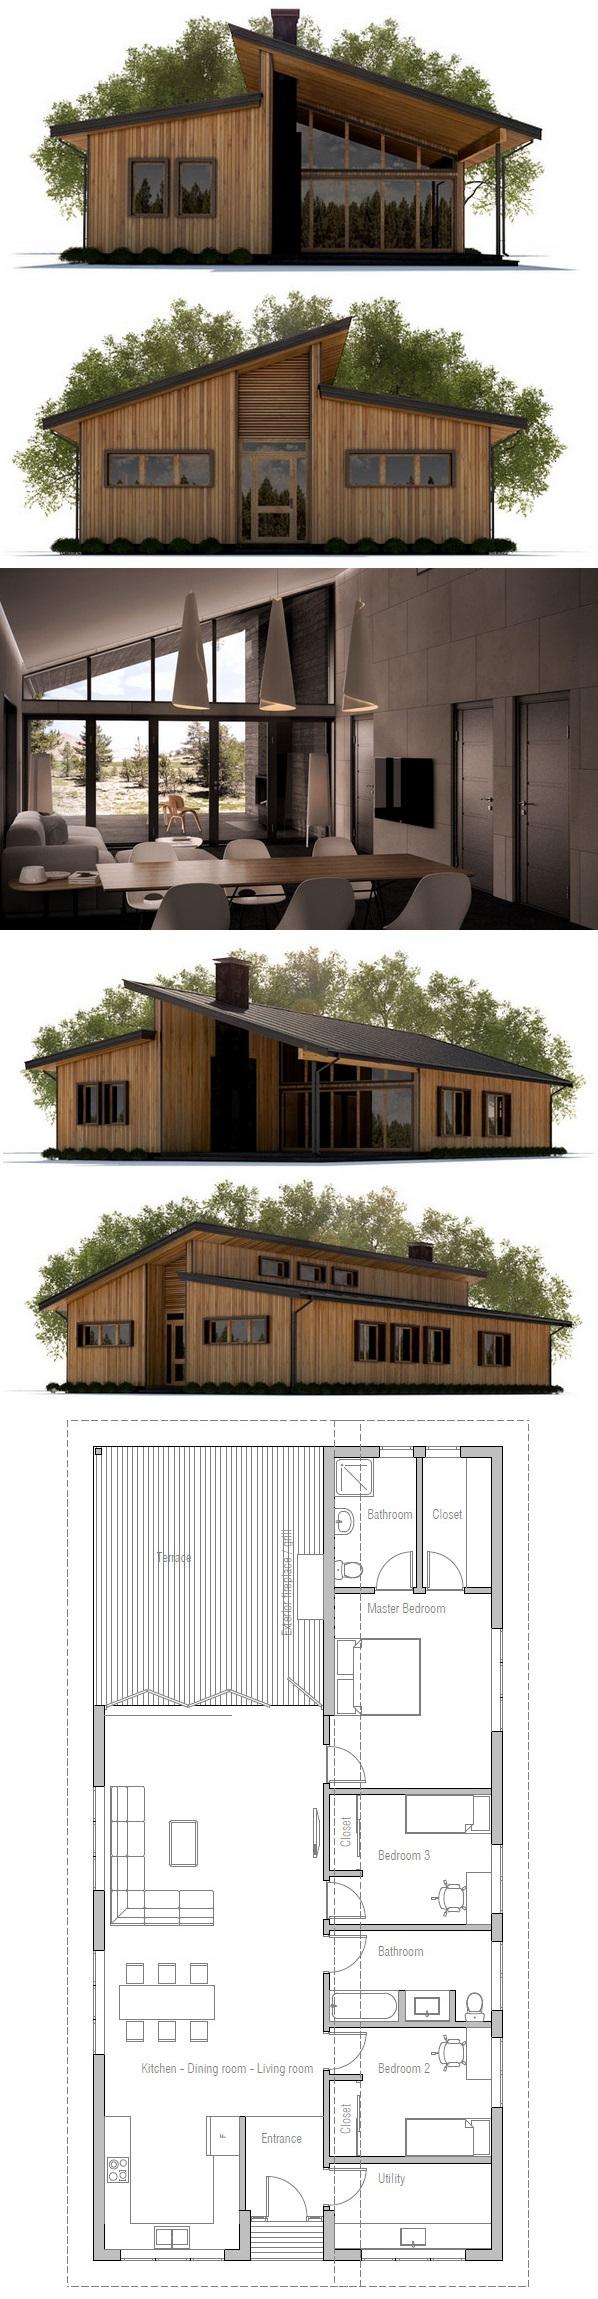 Home Plans, House Plans, Floor Plans #homeplans #houseplans #floorplans #architecture